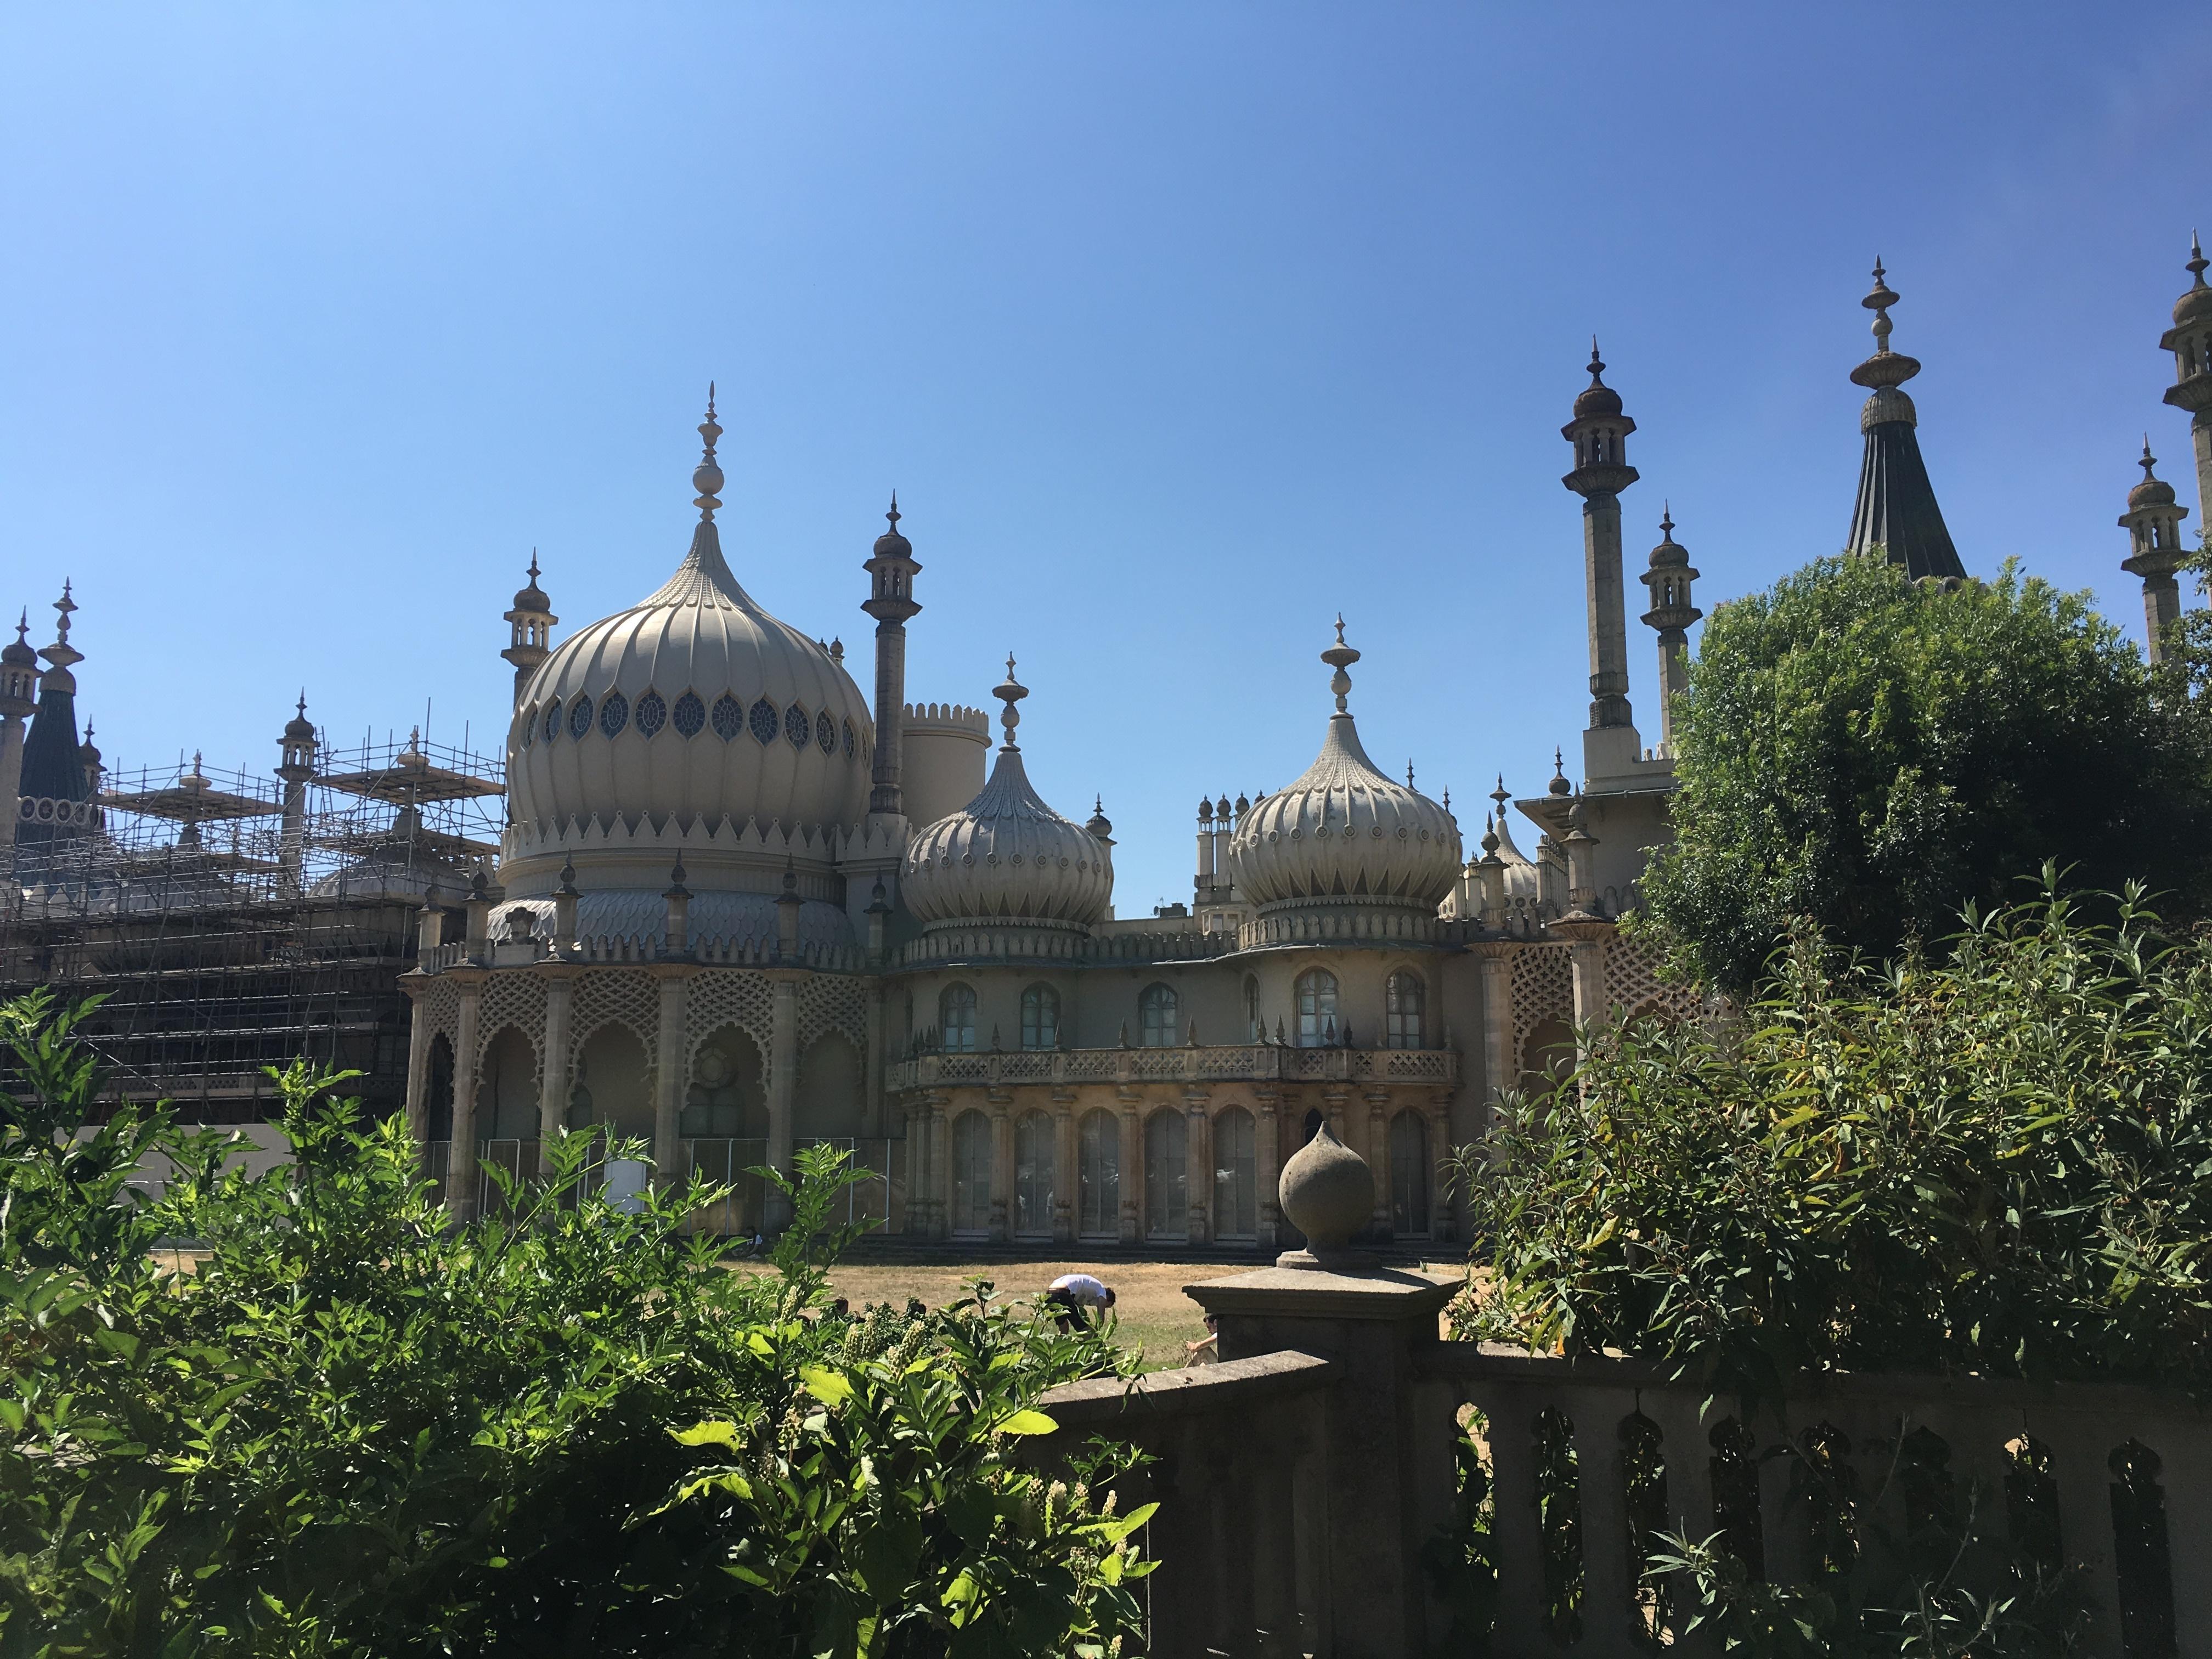 The Pavilion at Brighton